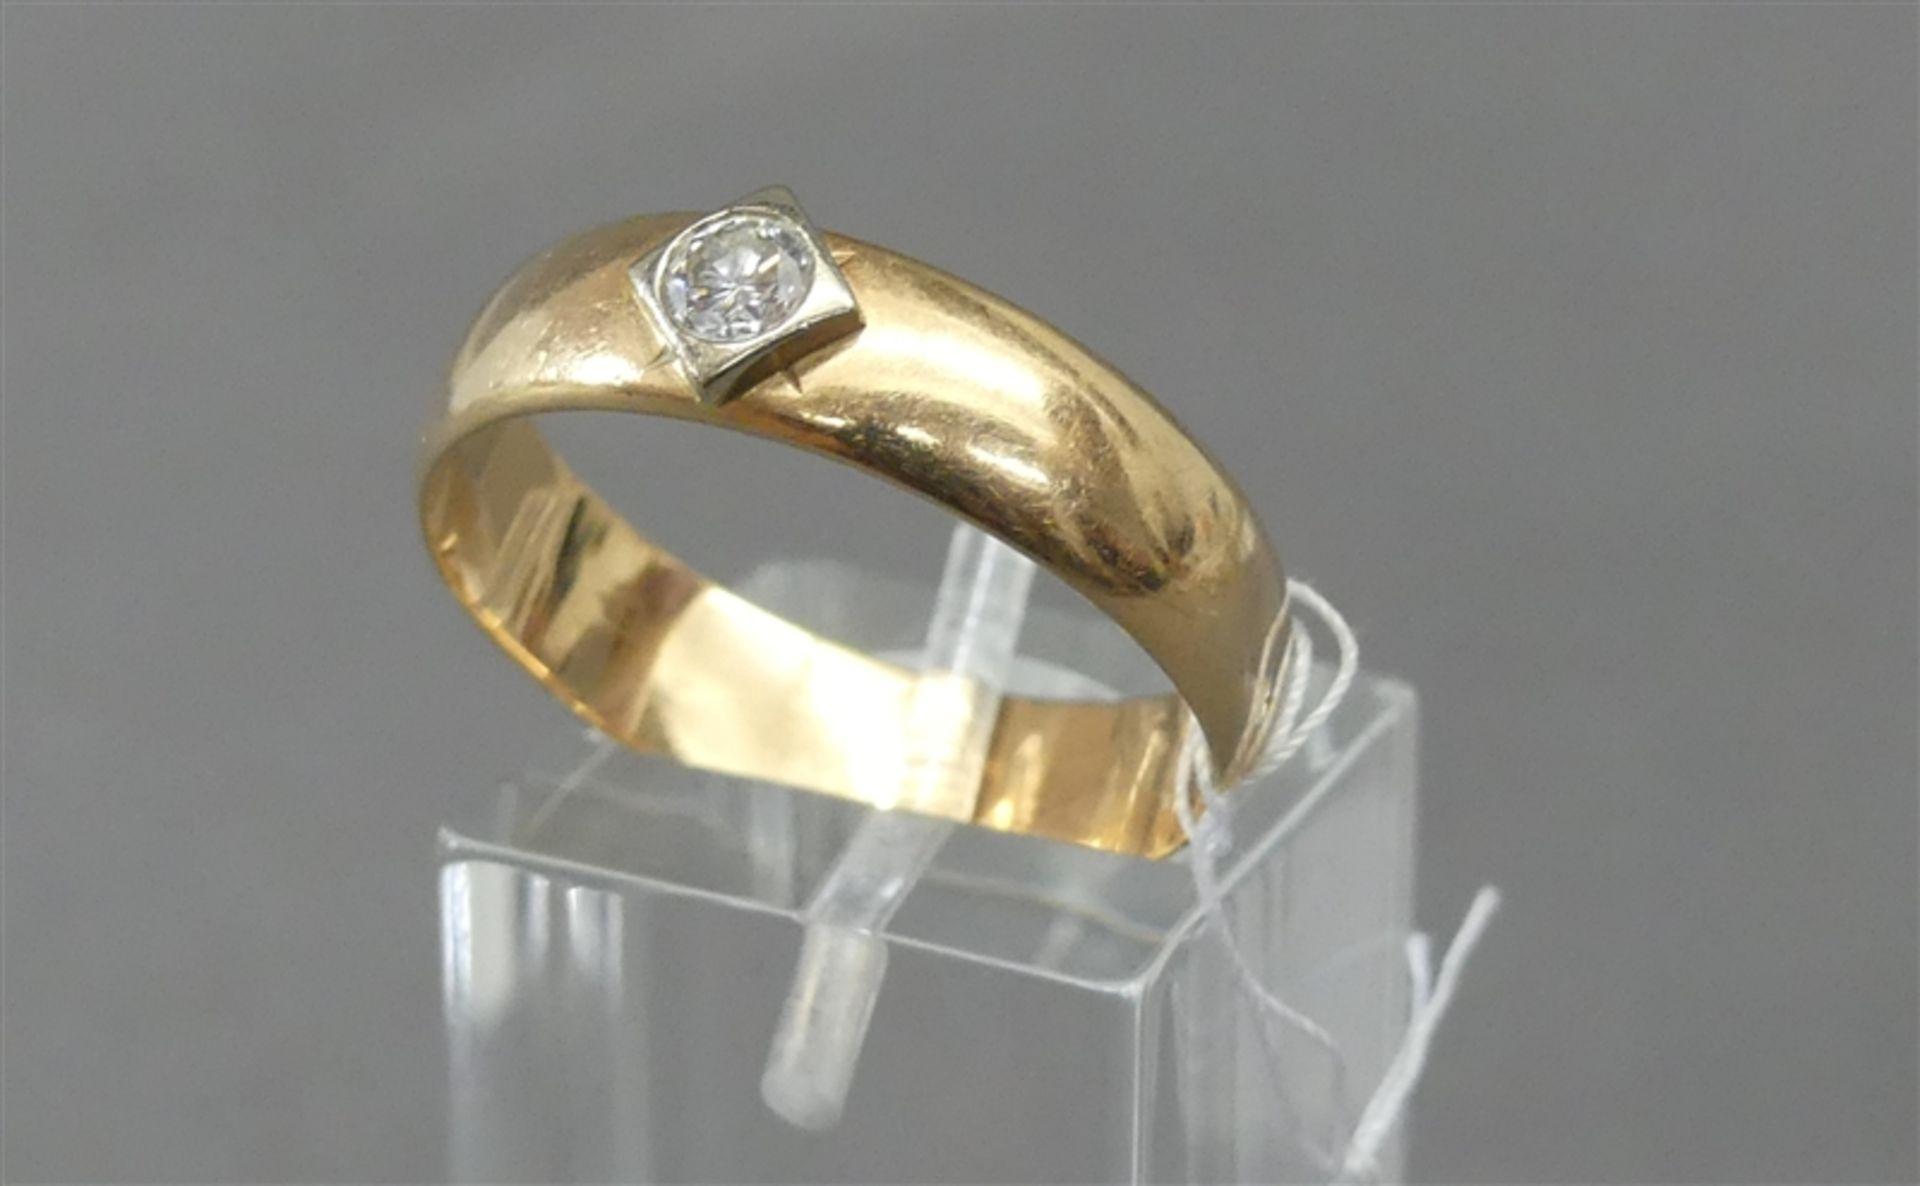 Damenring 14 kt. Rotgold, 1 Brillant ca 0,20 ct., weiß, ca 5g, RM 66